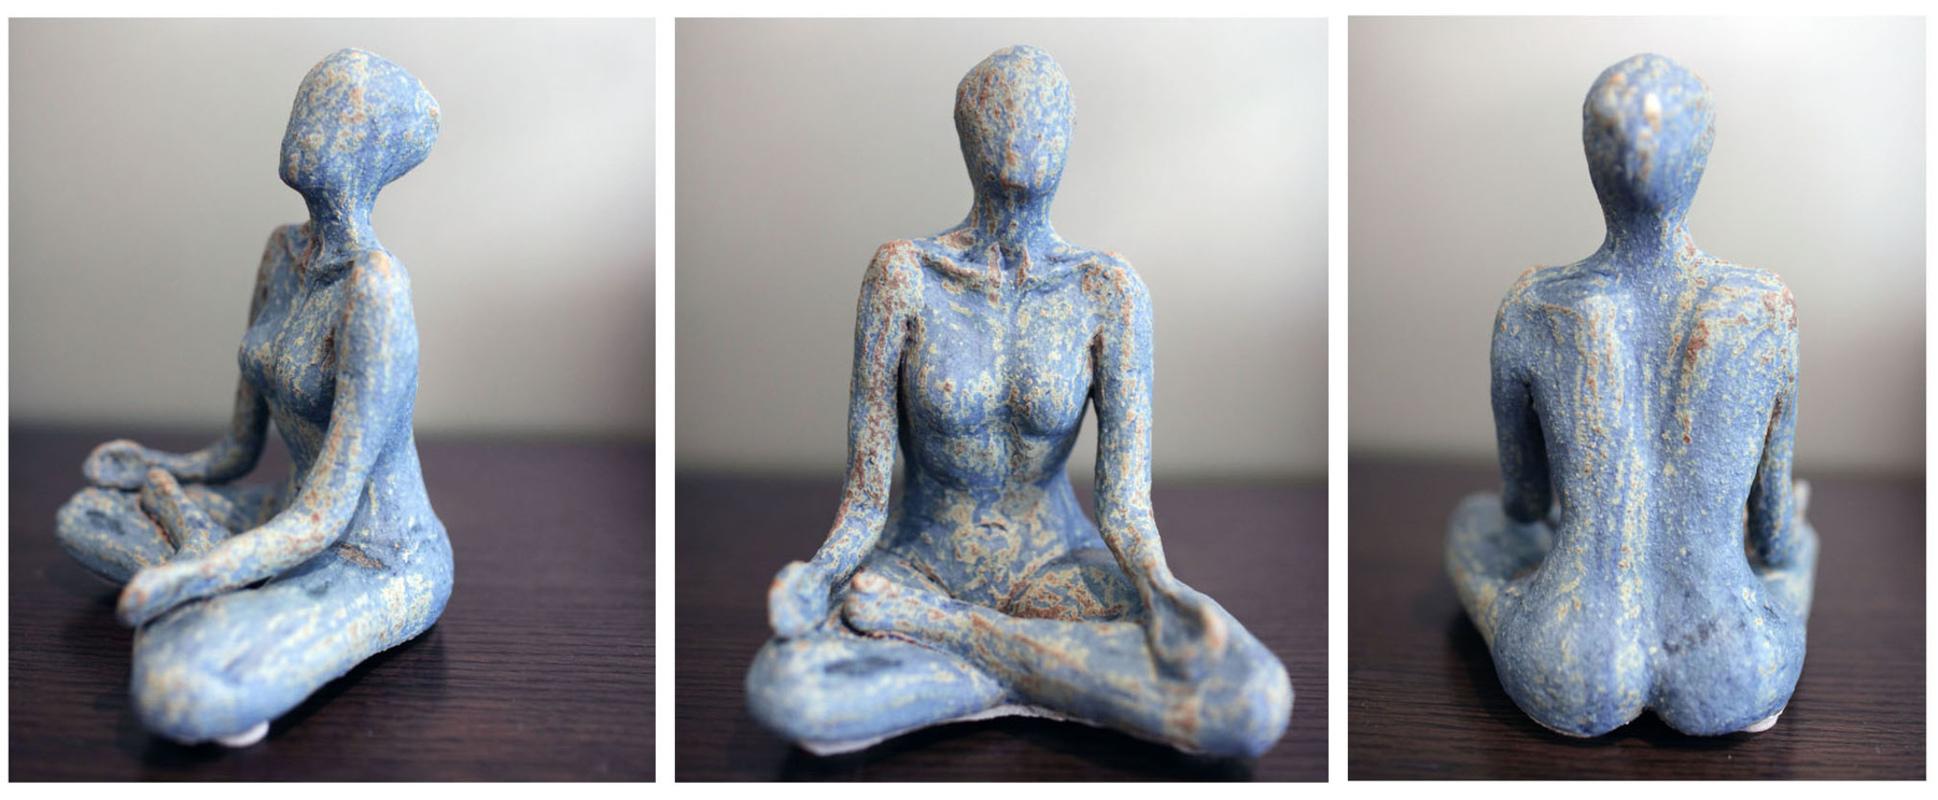 Karen Tabak Artist - Meditation 160w x 140d x 210h. Ceramic clay, fired.